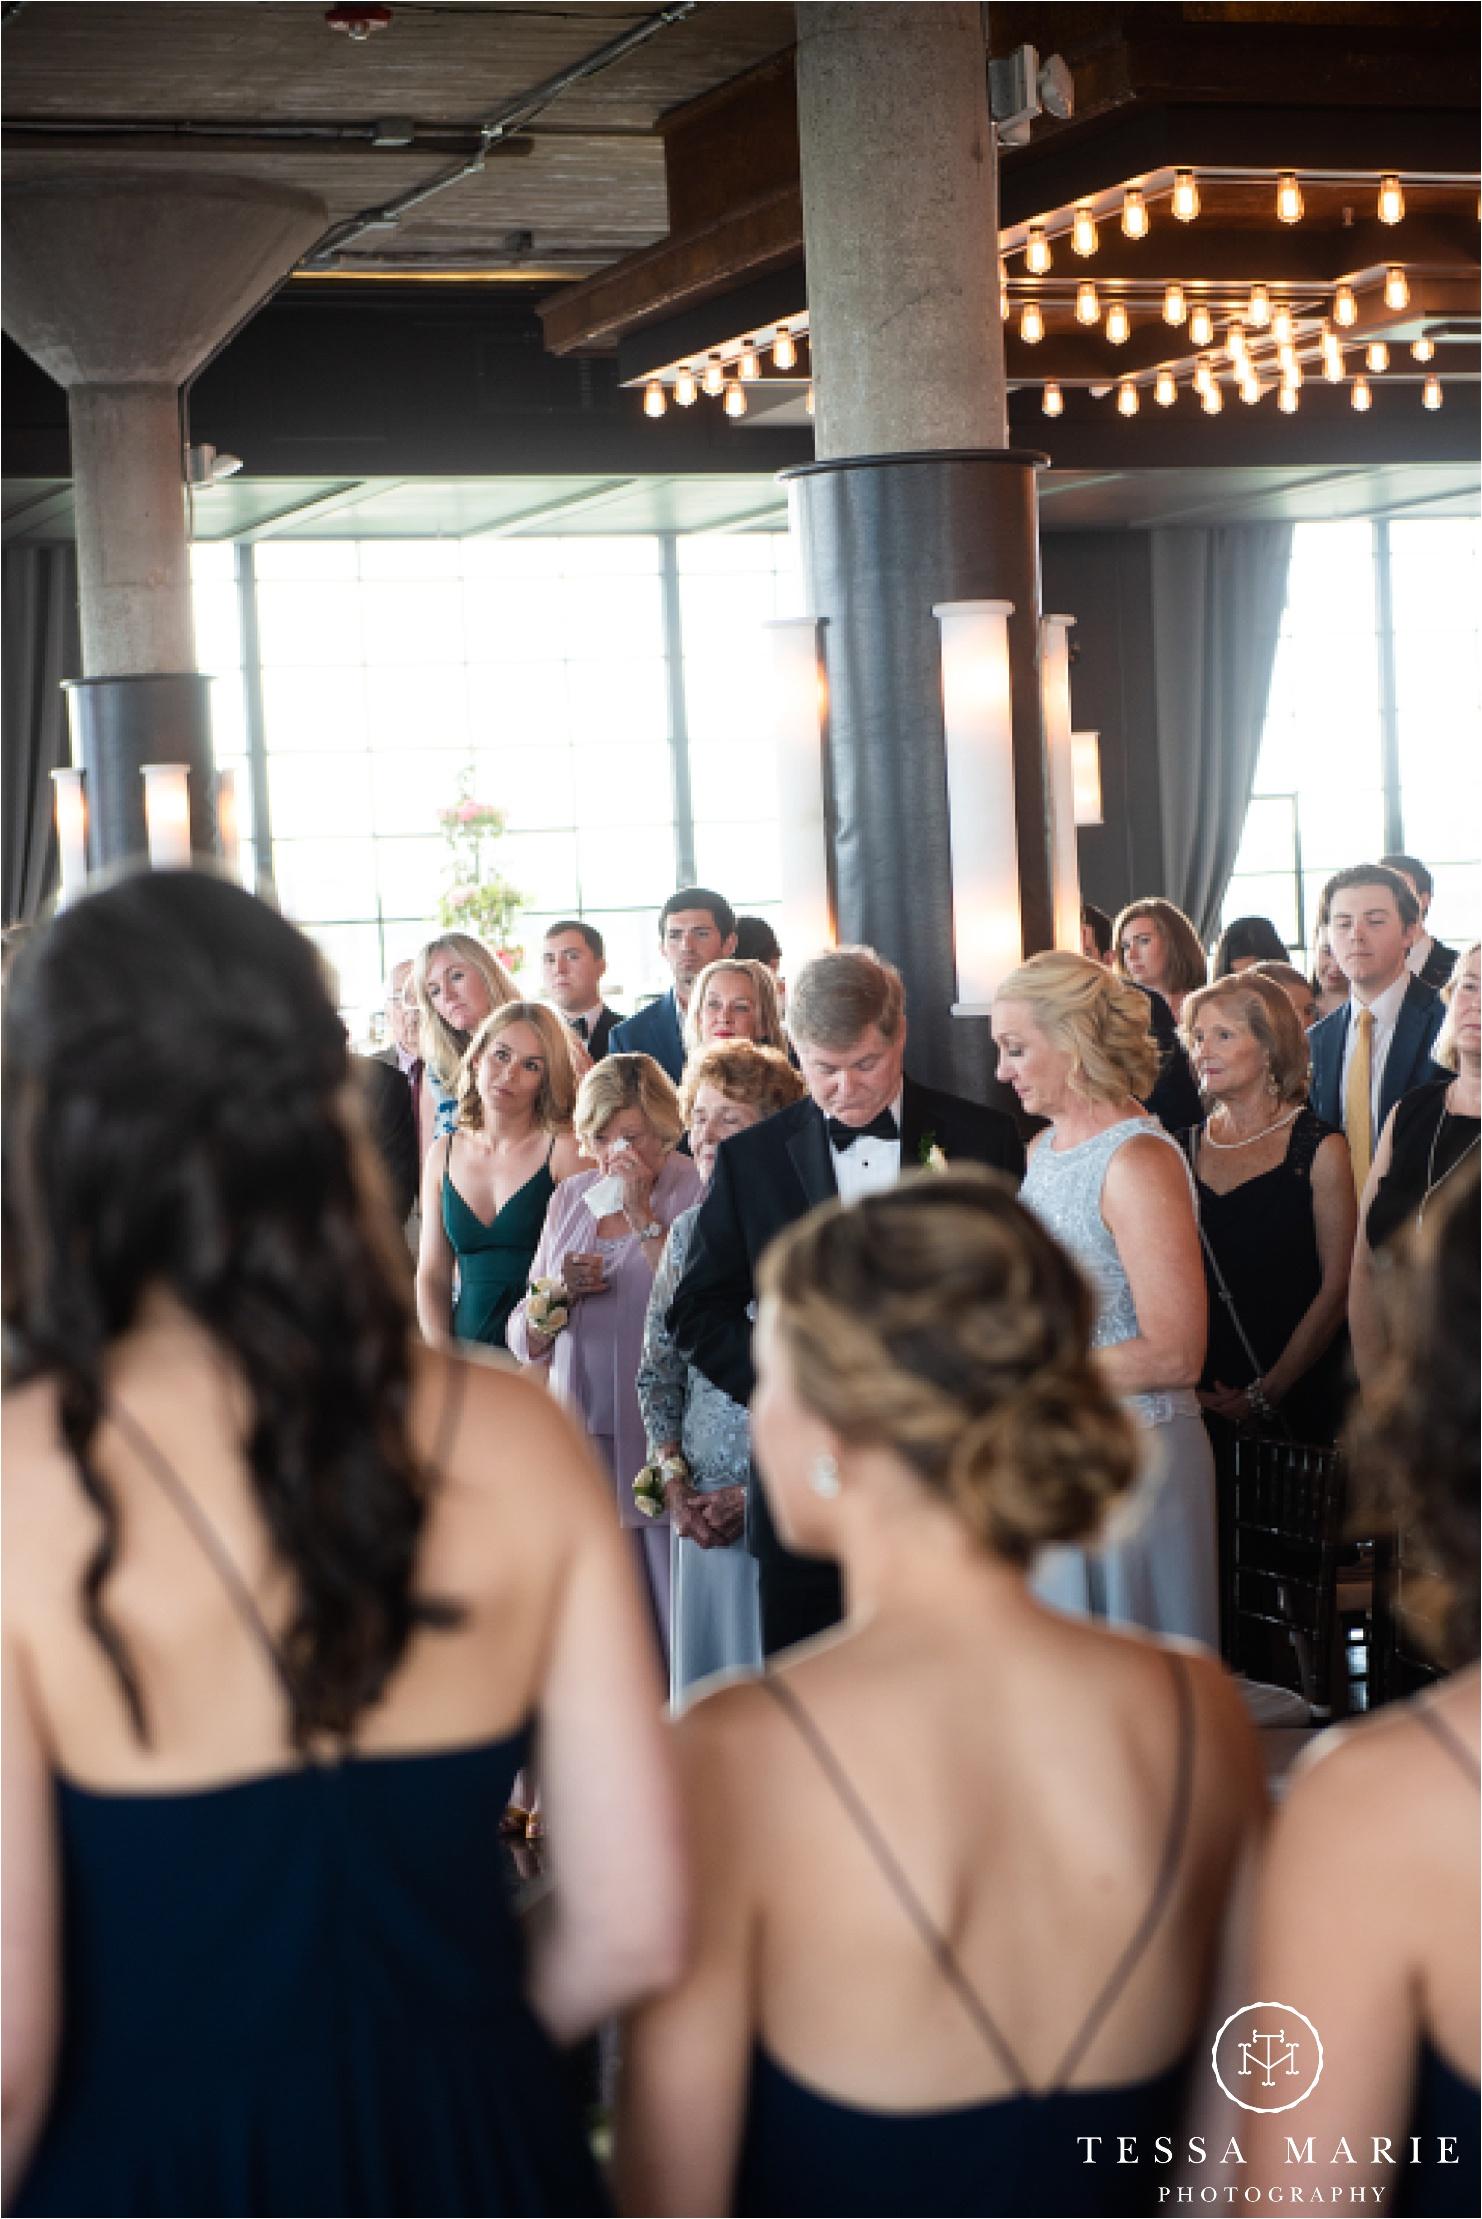 Tessa_marie_weddings_houston_wedding_photographer_The_astorian_0114.jpg